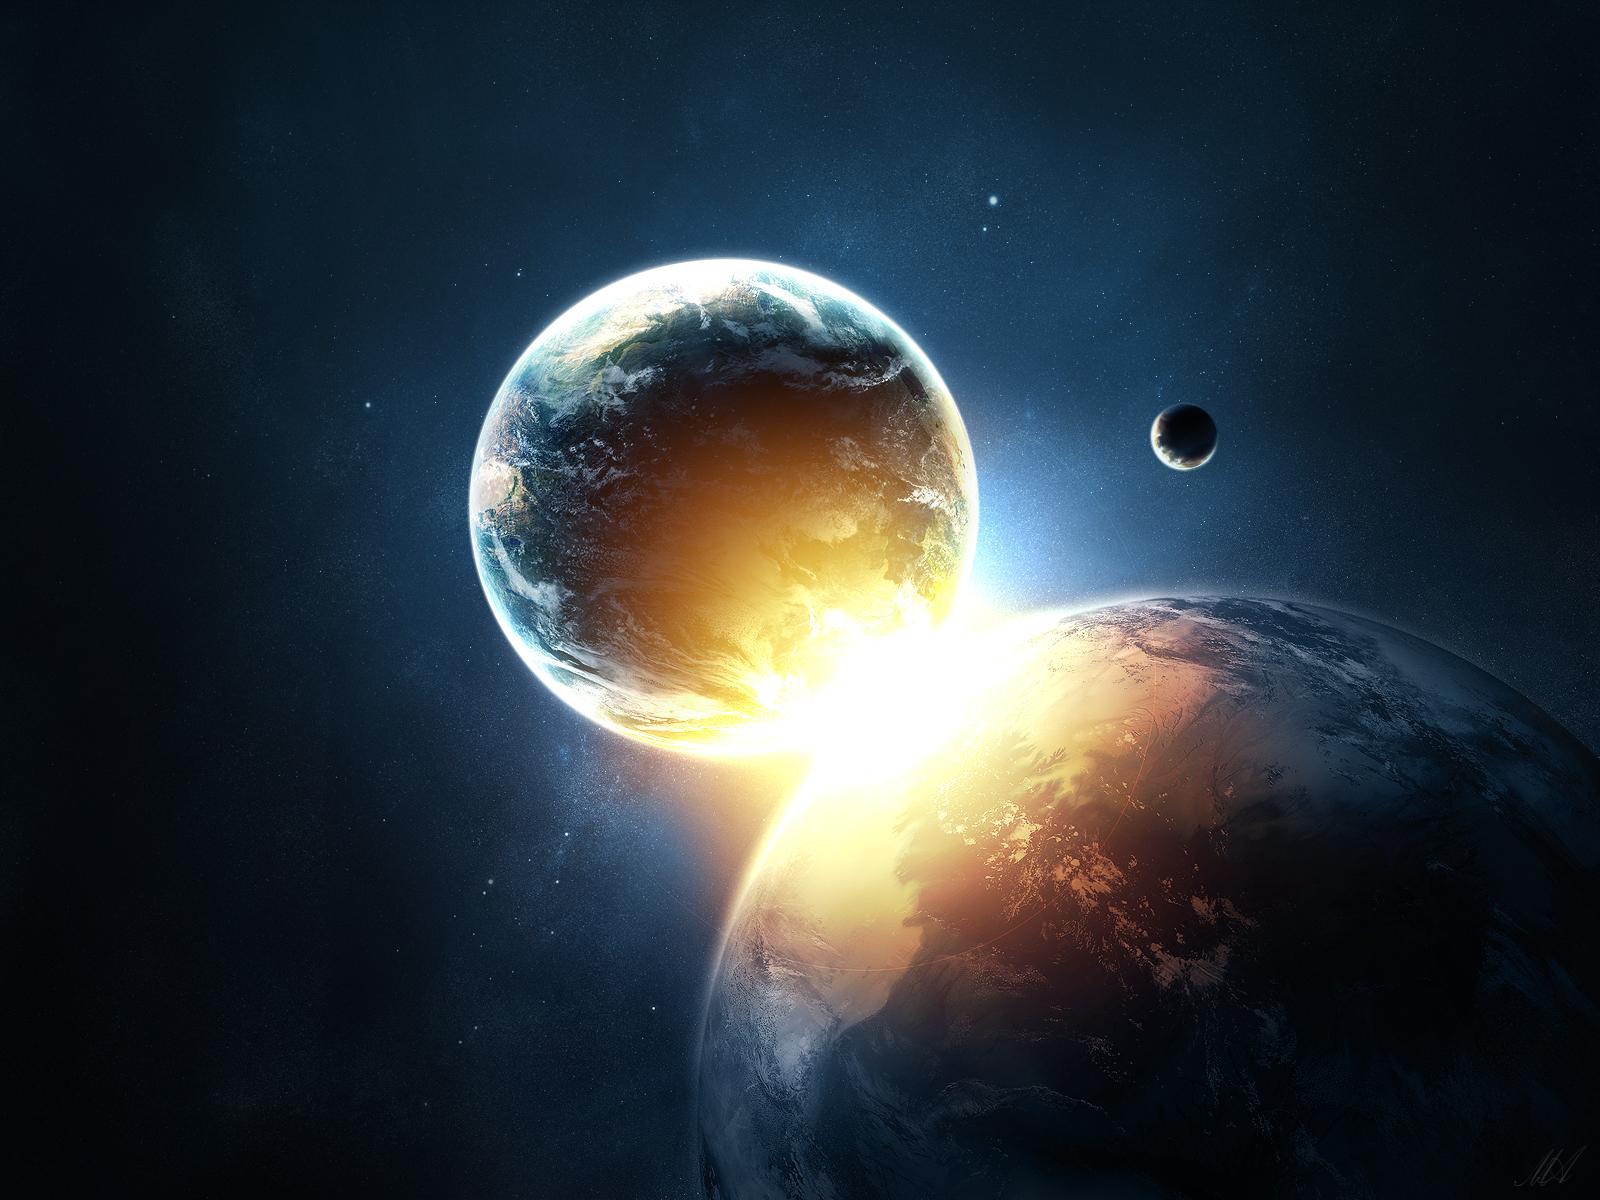 Wallpaper Planets Collide Universe